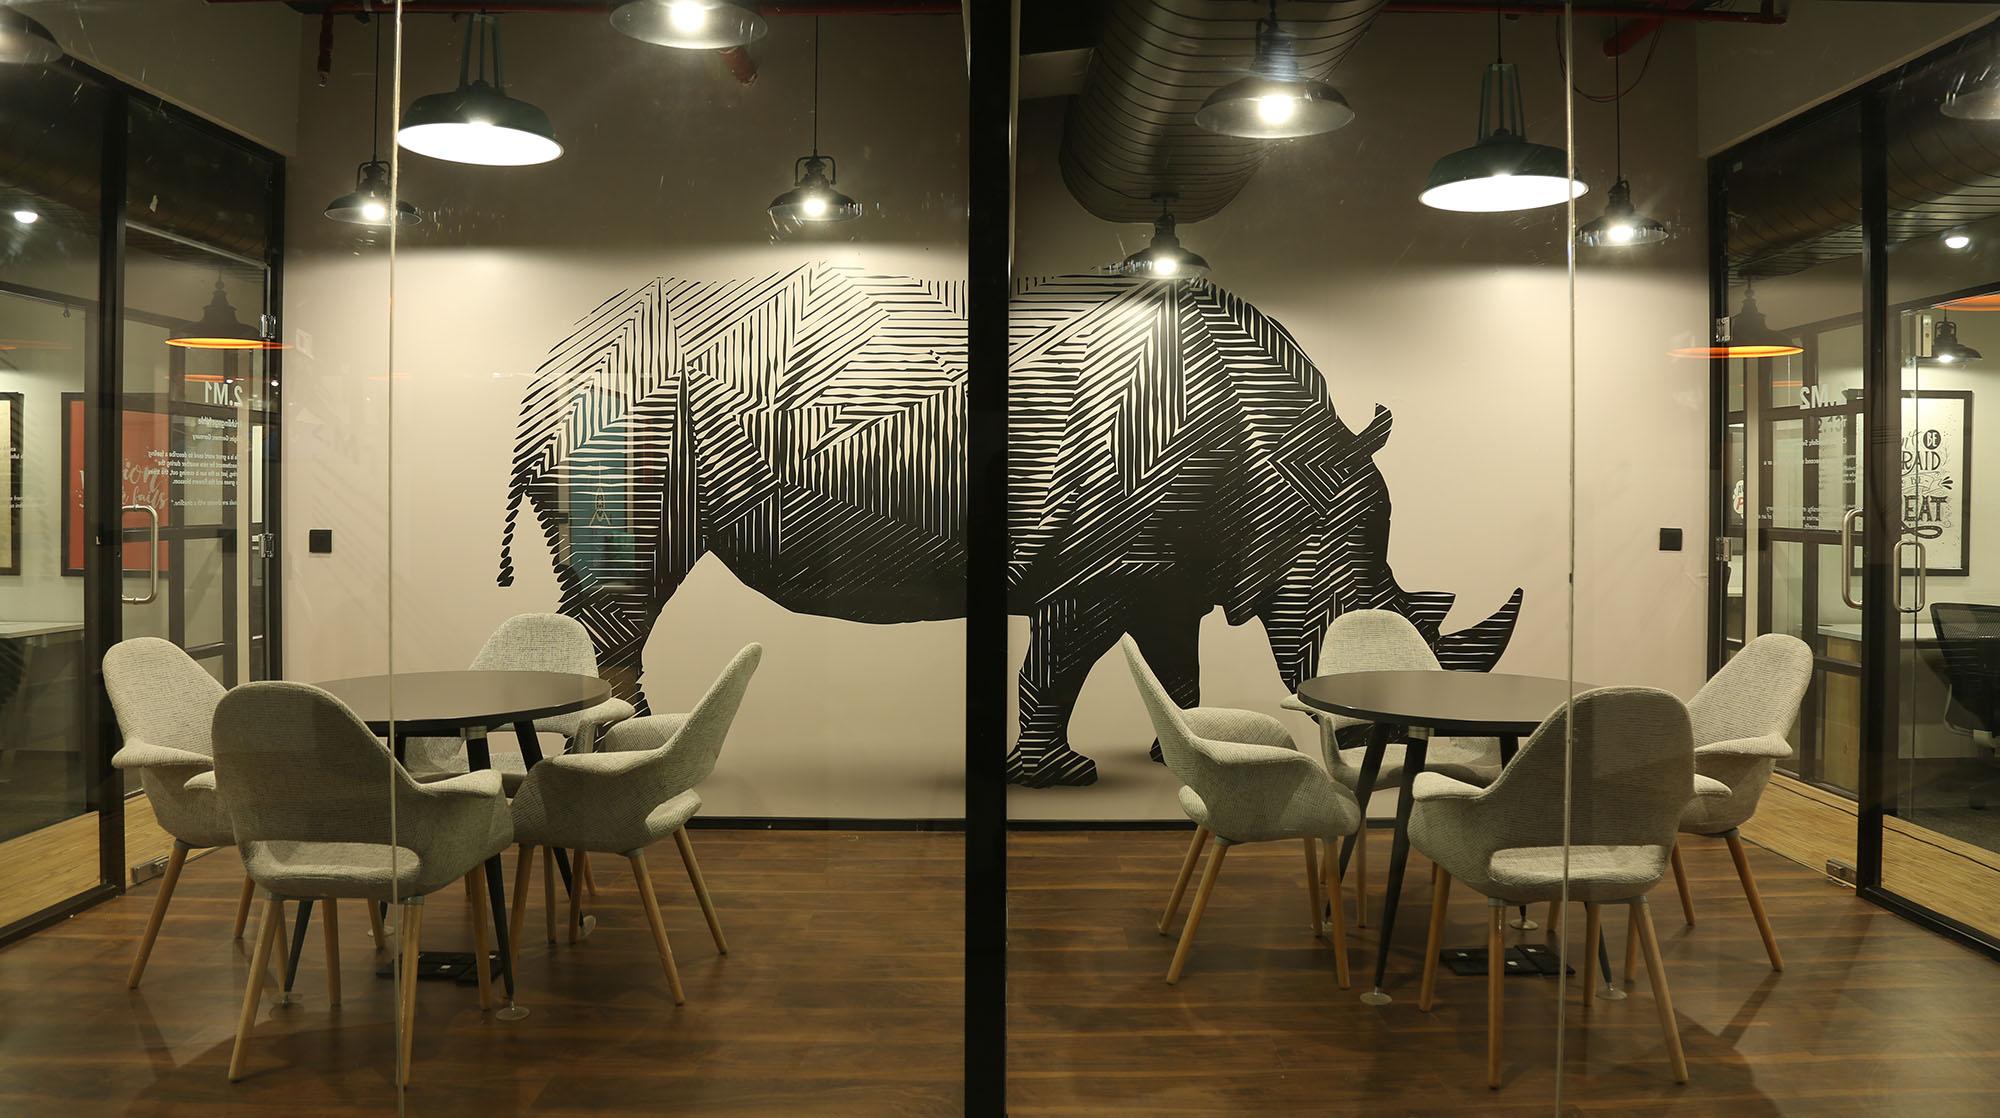 Studio Gritt Innov8 Noida 6.jpg